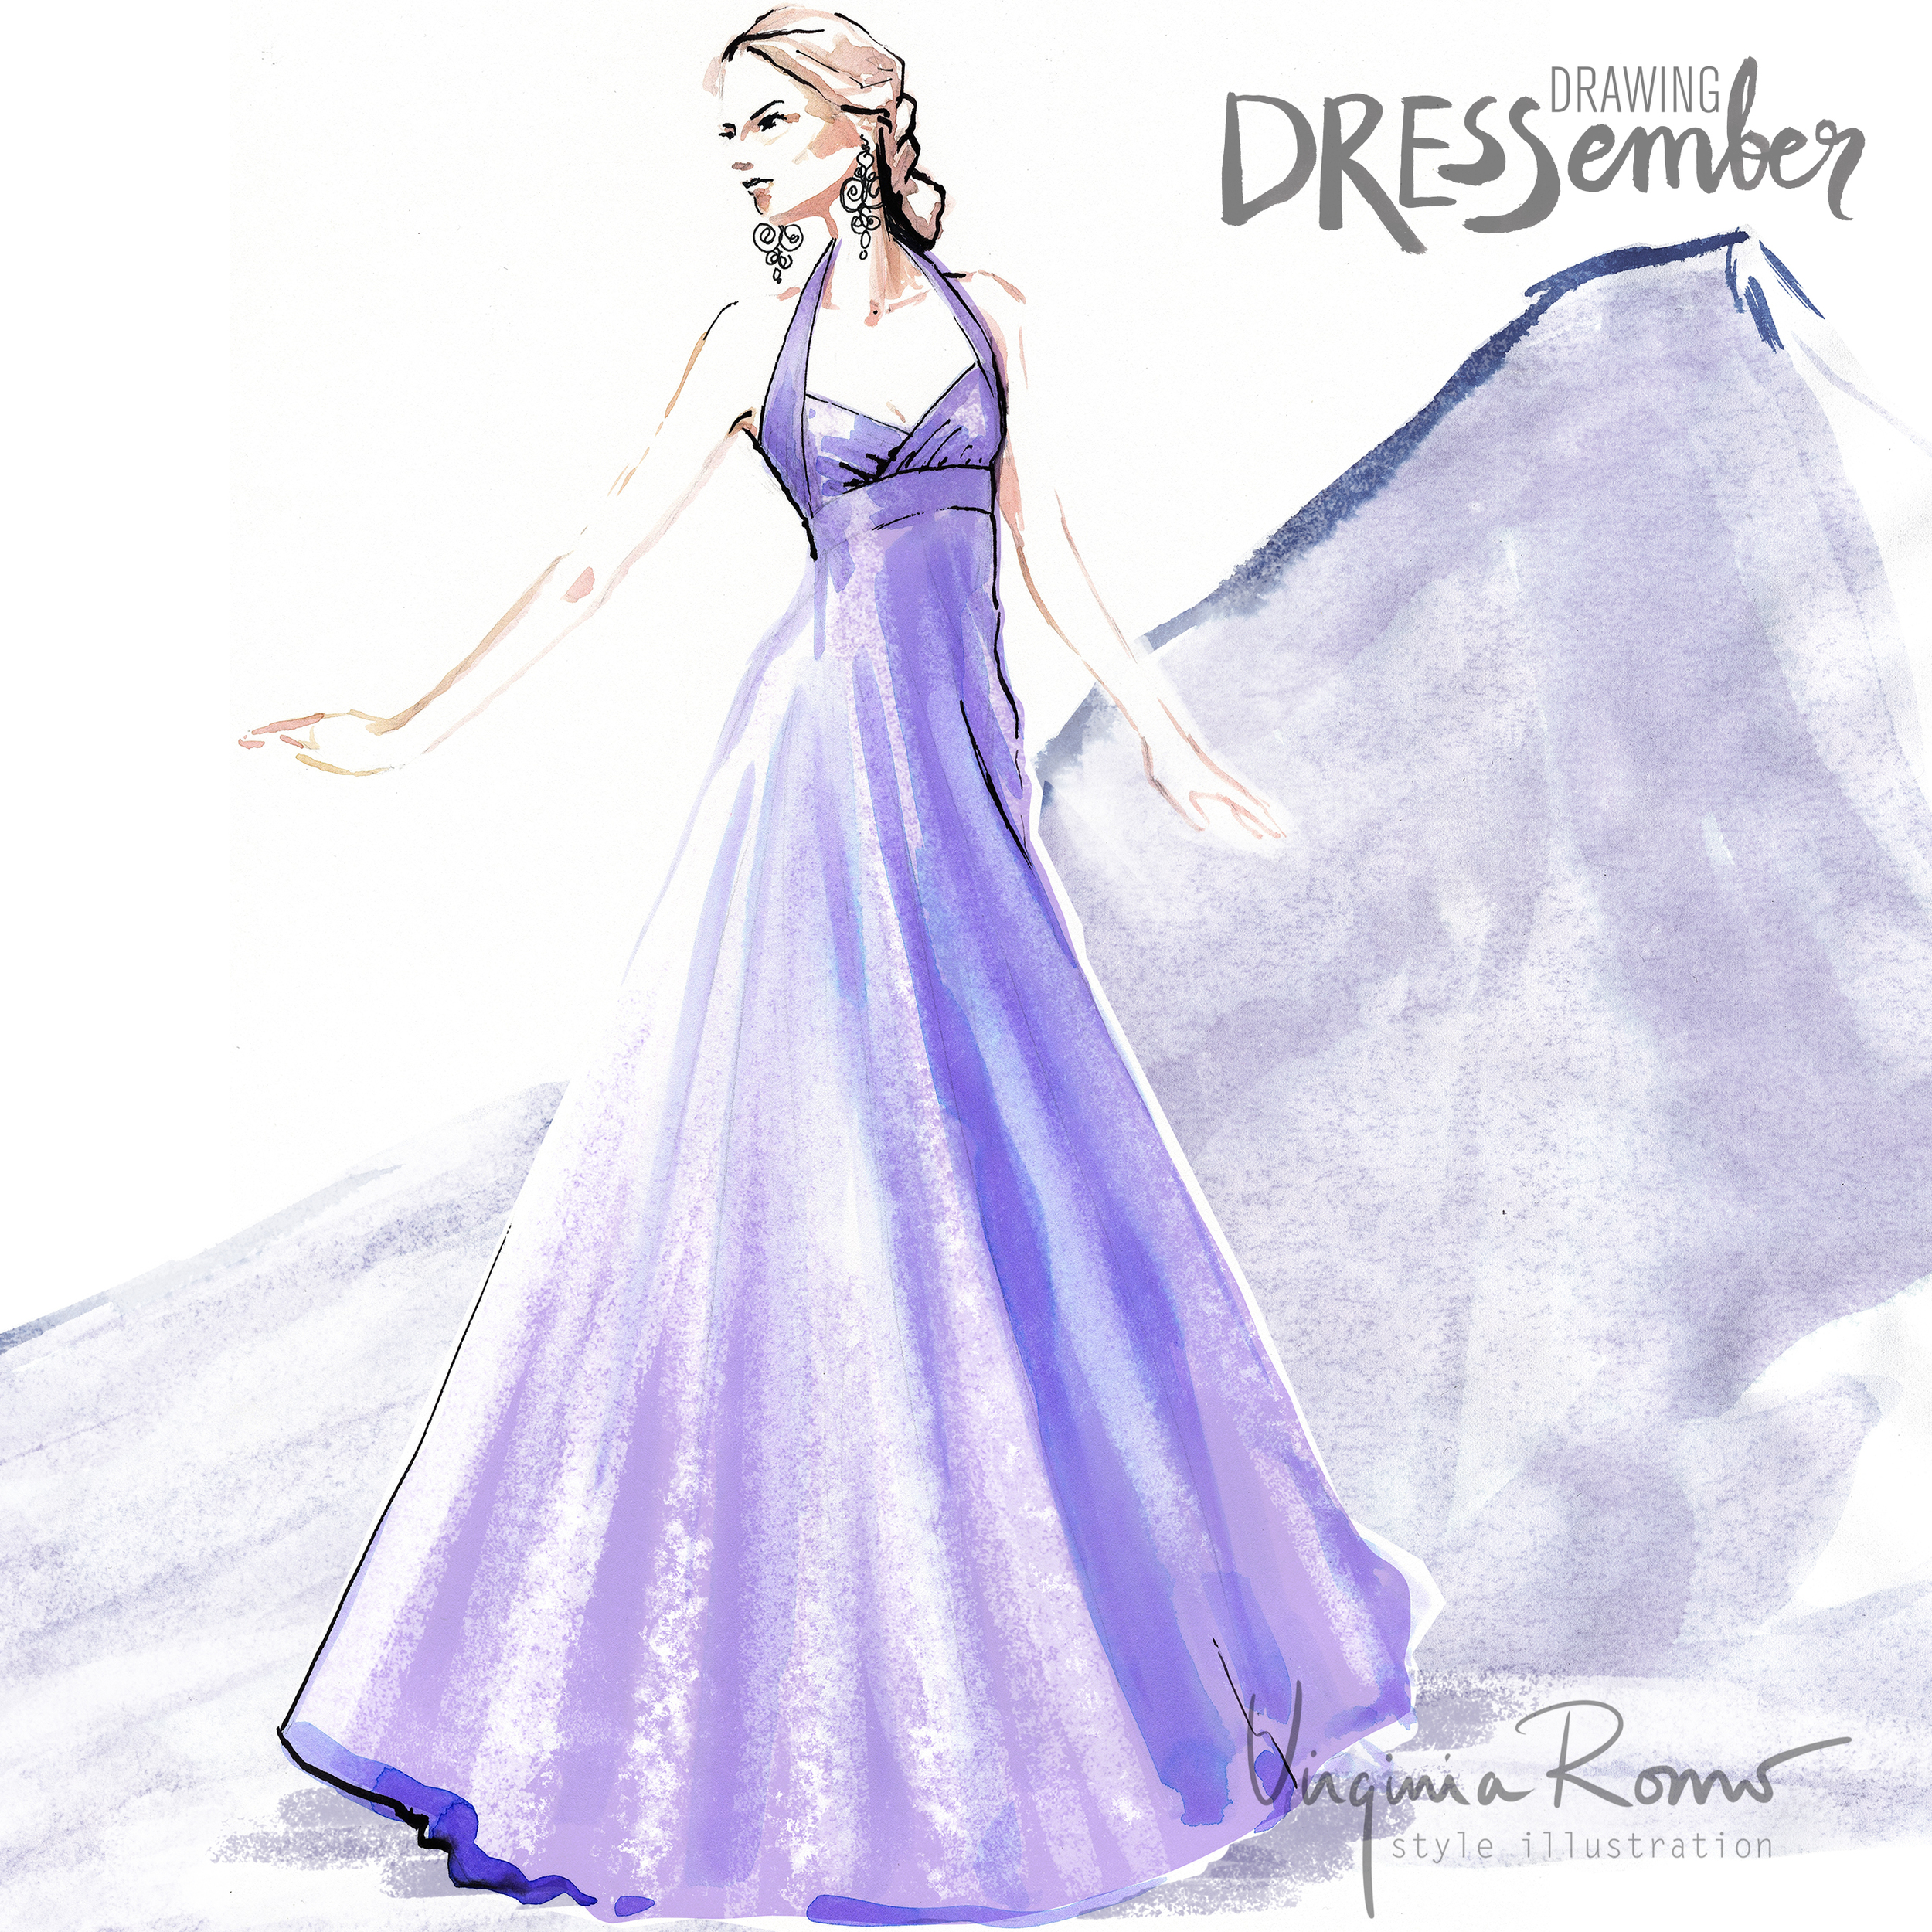 dressember-VirginiaRomoIllustration-12-Eva-IG.jpg